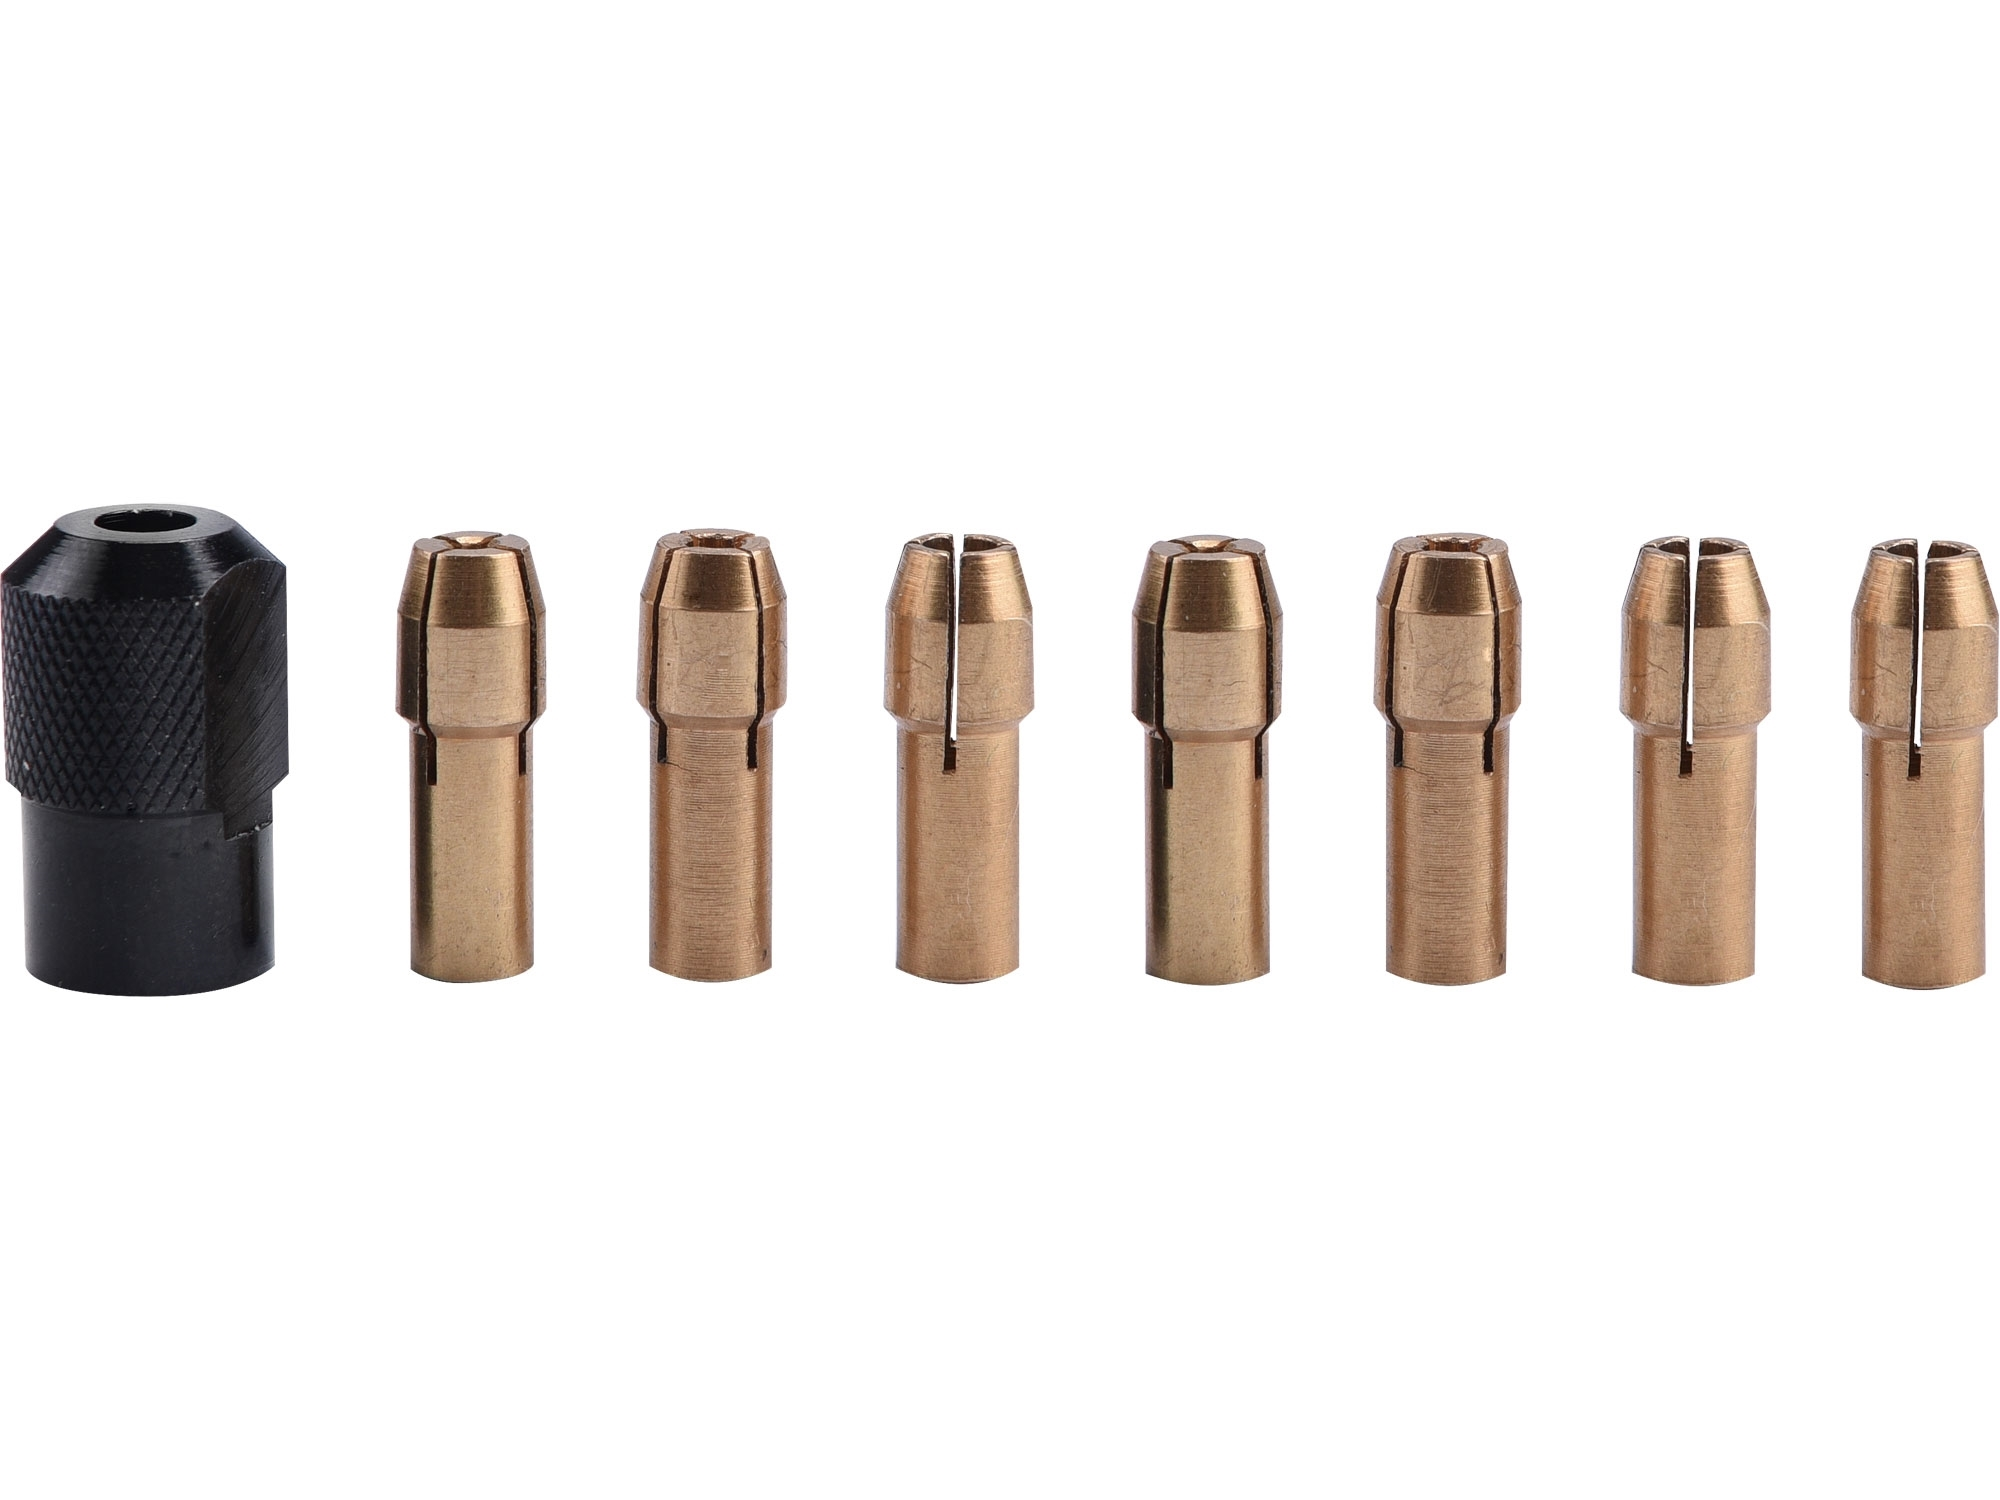 kleštiny, sada 8ks, ⌀ 1-1,6-2-2,3-3-2x3,2mm, hlavice M8x0,75